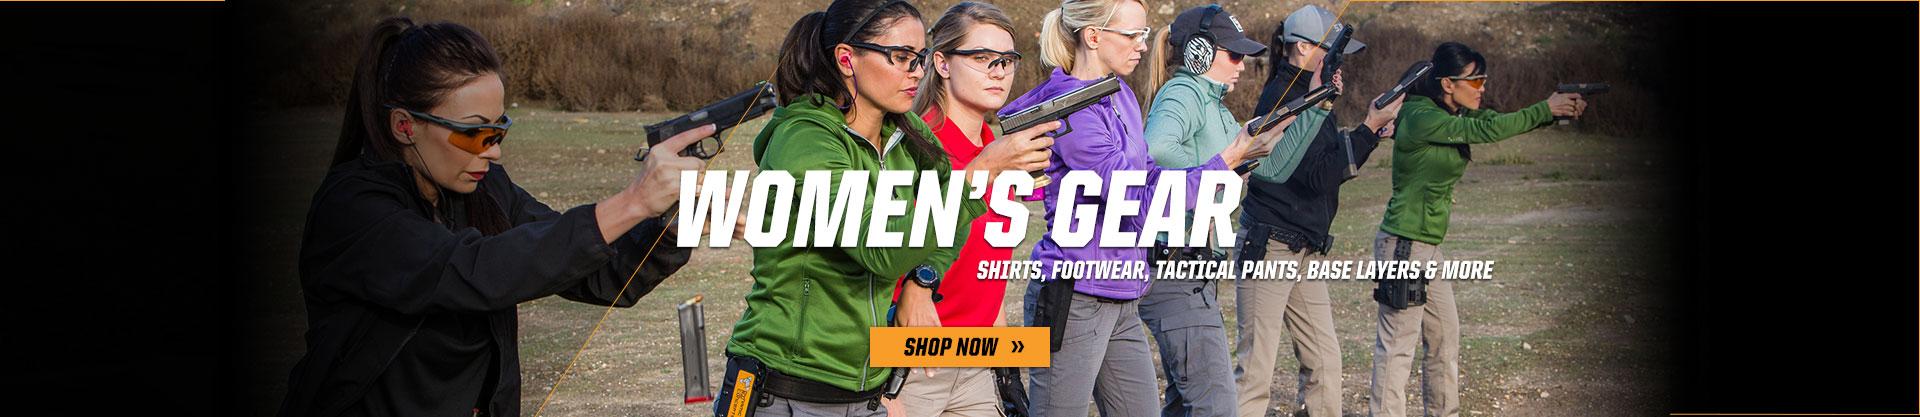 5.11 Tactical womens gear